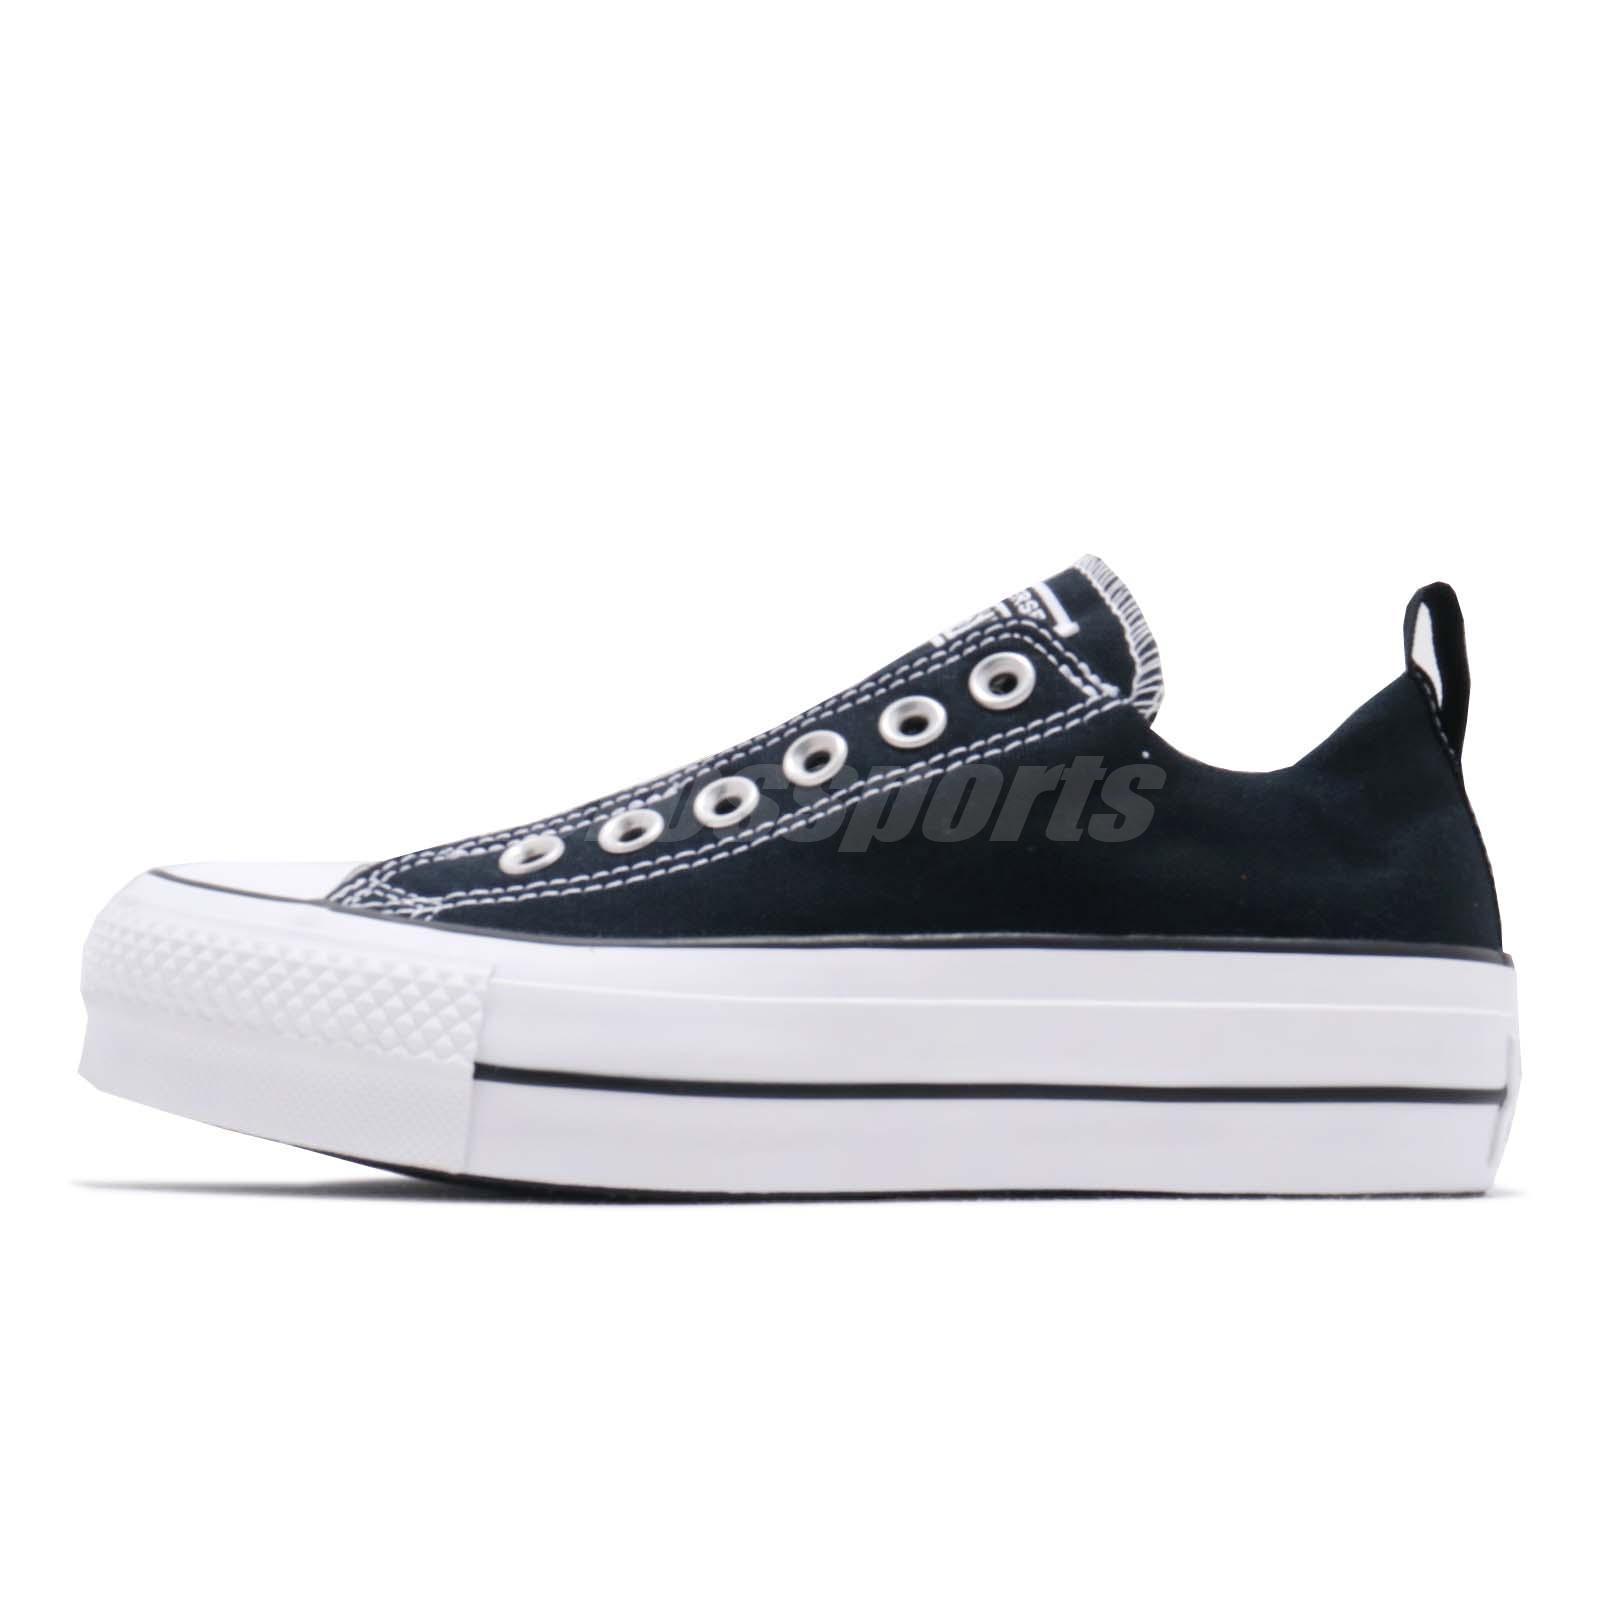 a7acbc2ddff6 Converse Chuck Taylor All Star Lift Slip On Black White Women Shoes 563456C